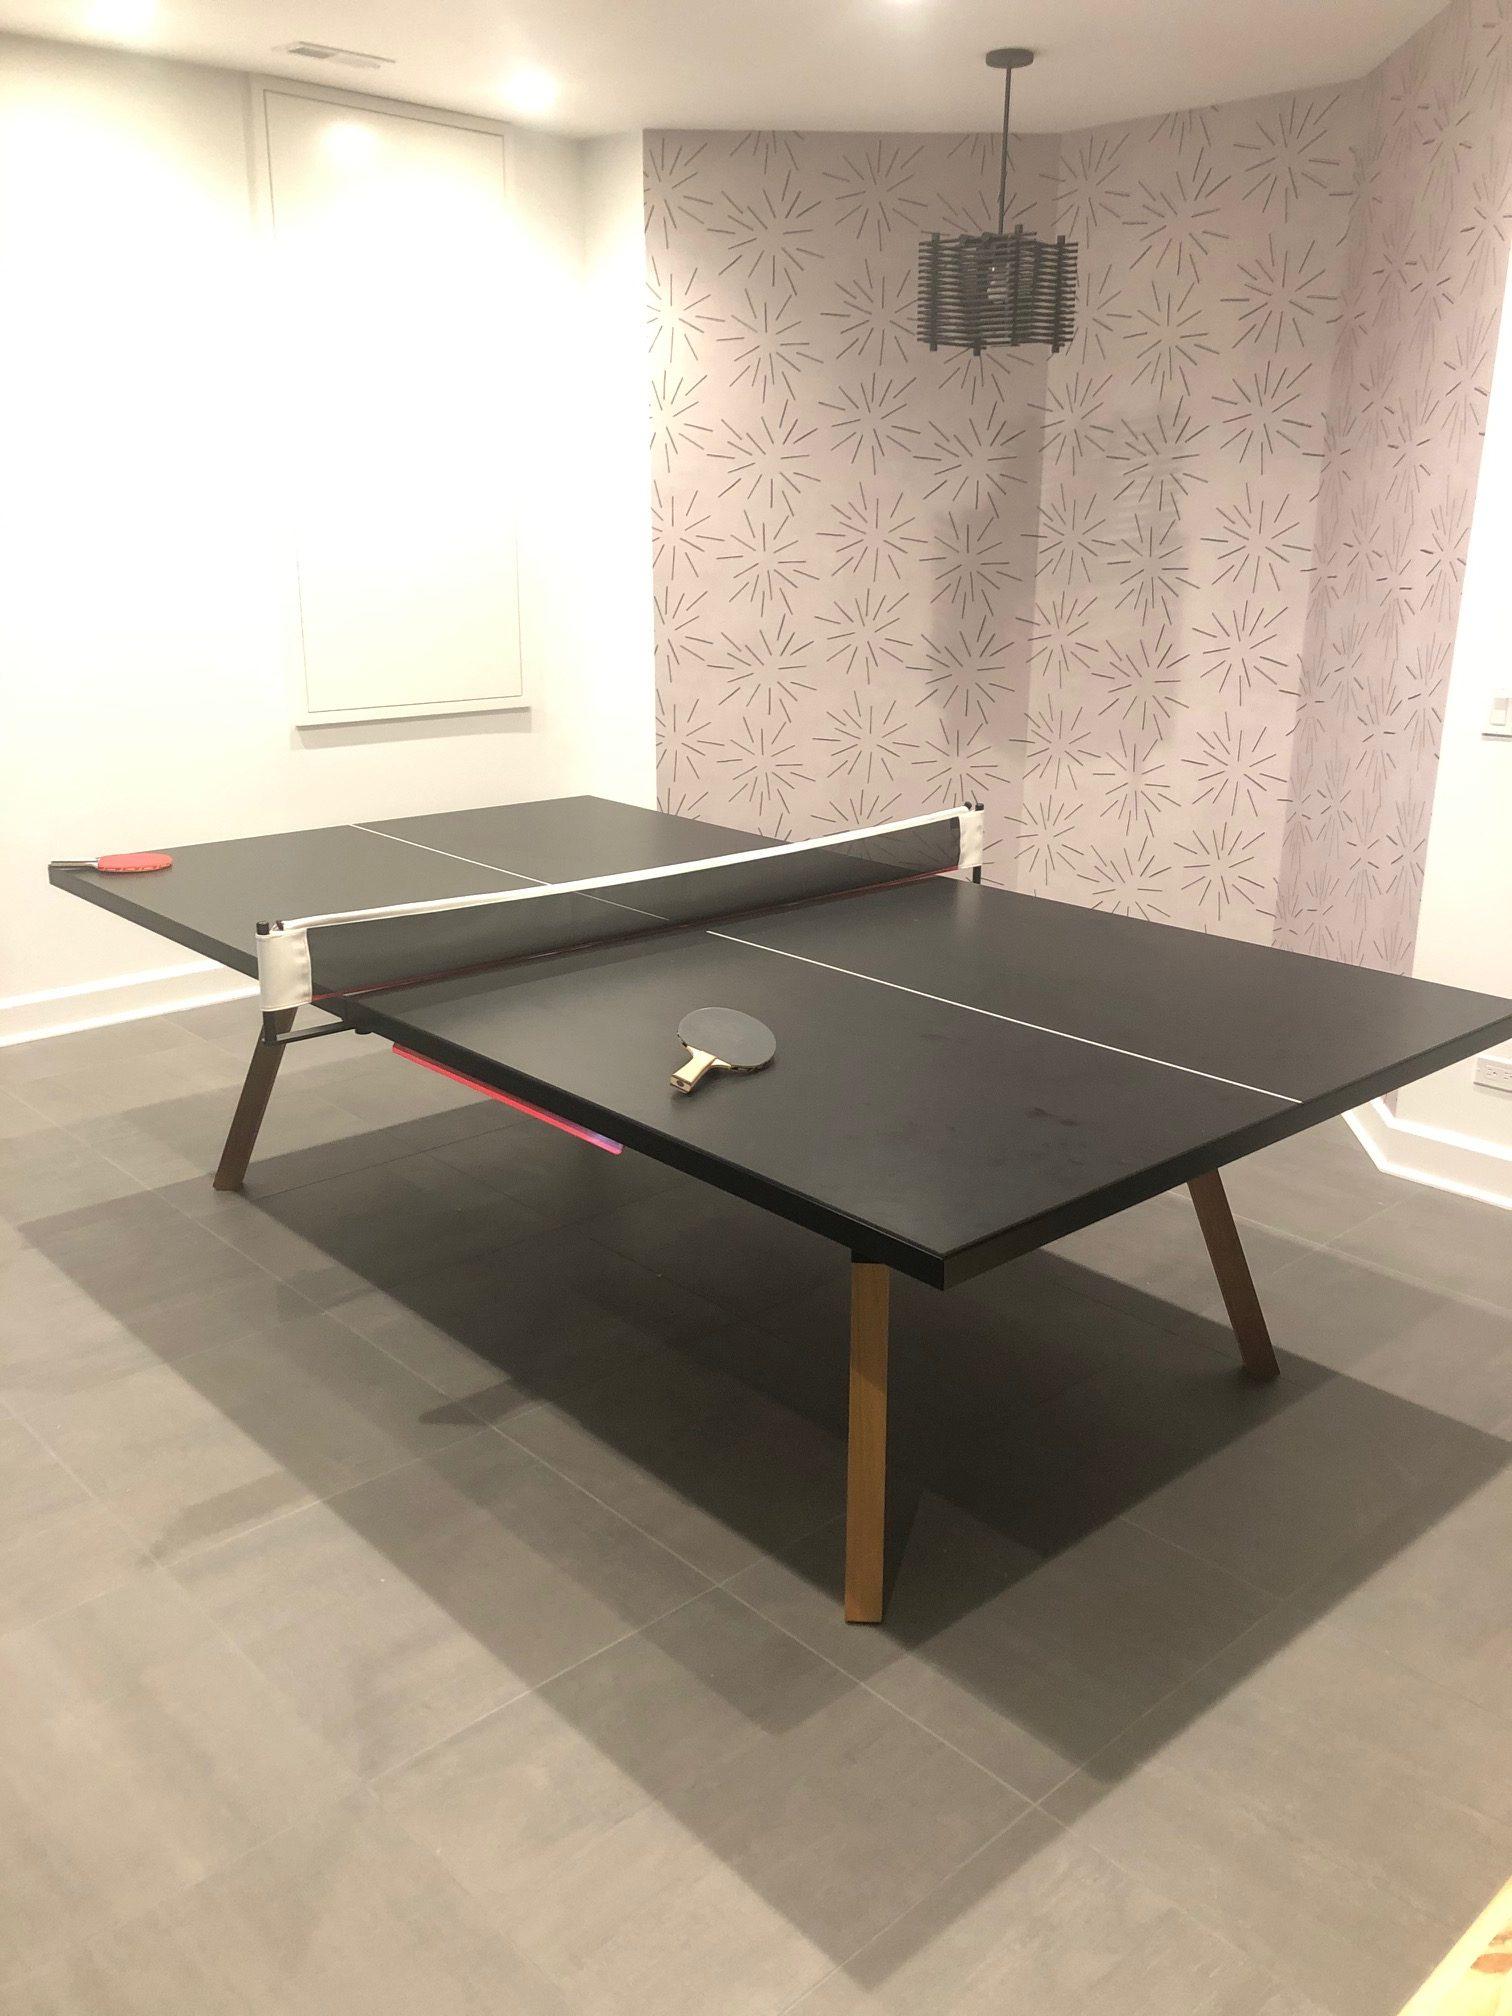 RS Barcelona You and Me black ping pong table